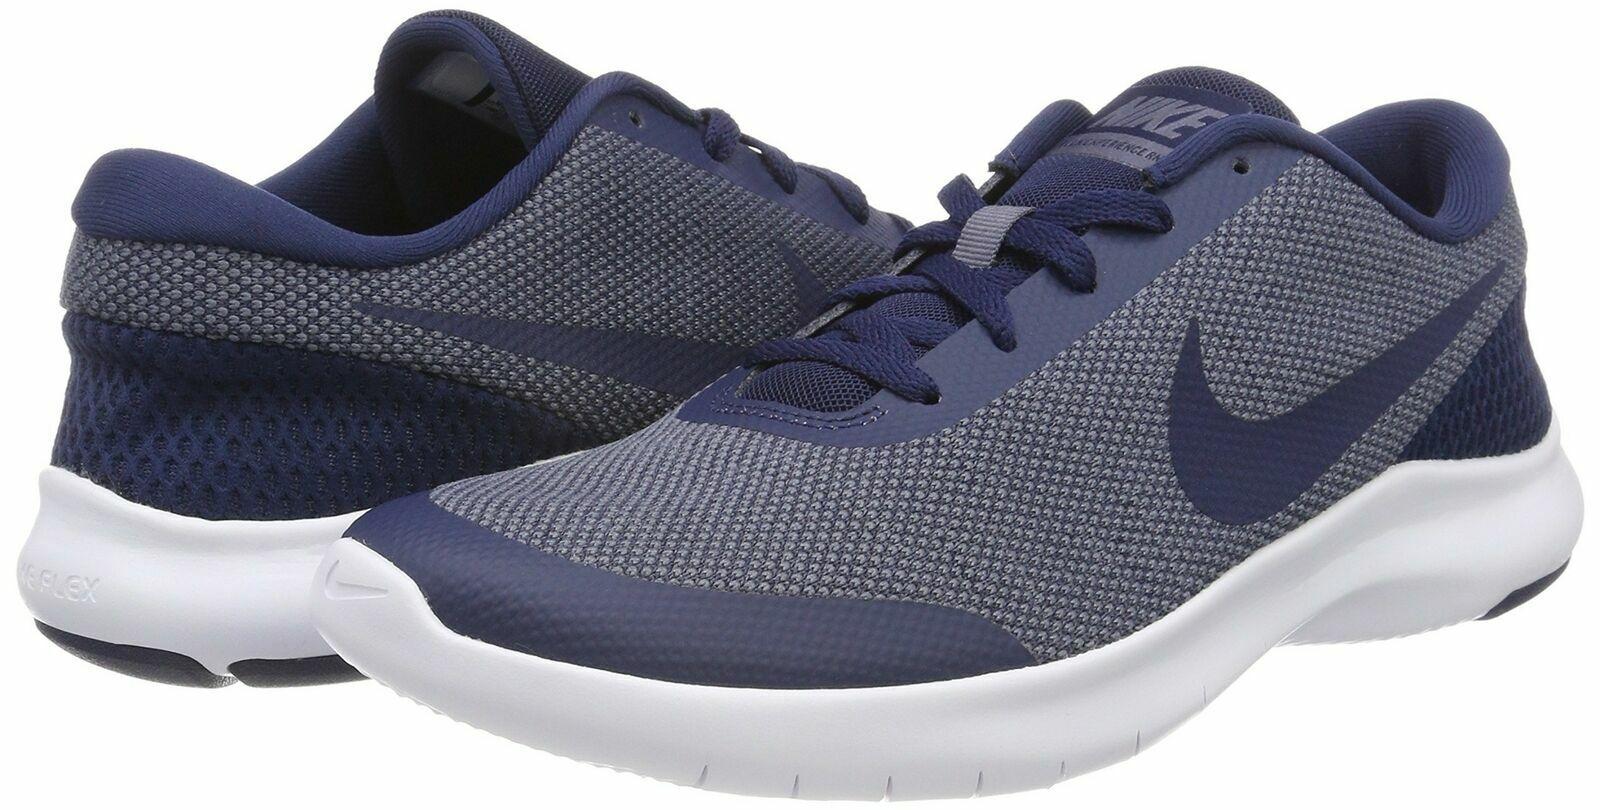 c709eb3c9f530 Nike Flex Experience RN 7 Running Shoes Blue White 908985-400 Men's NEW